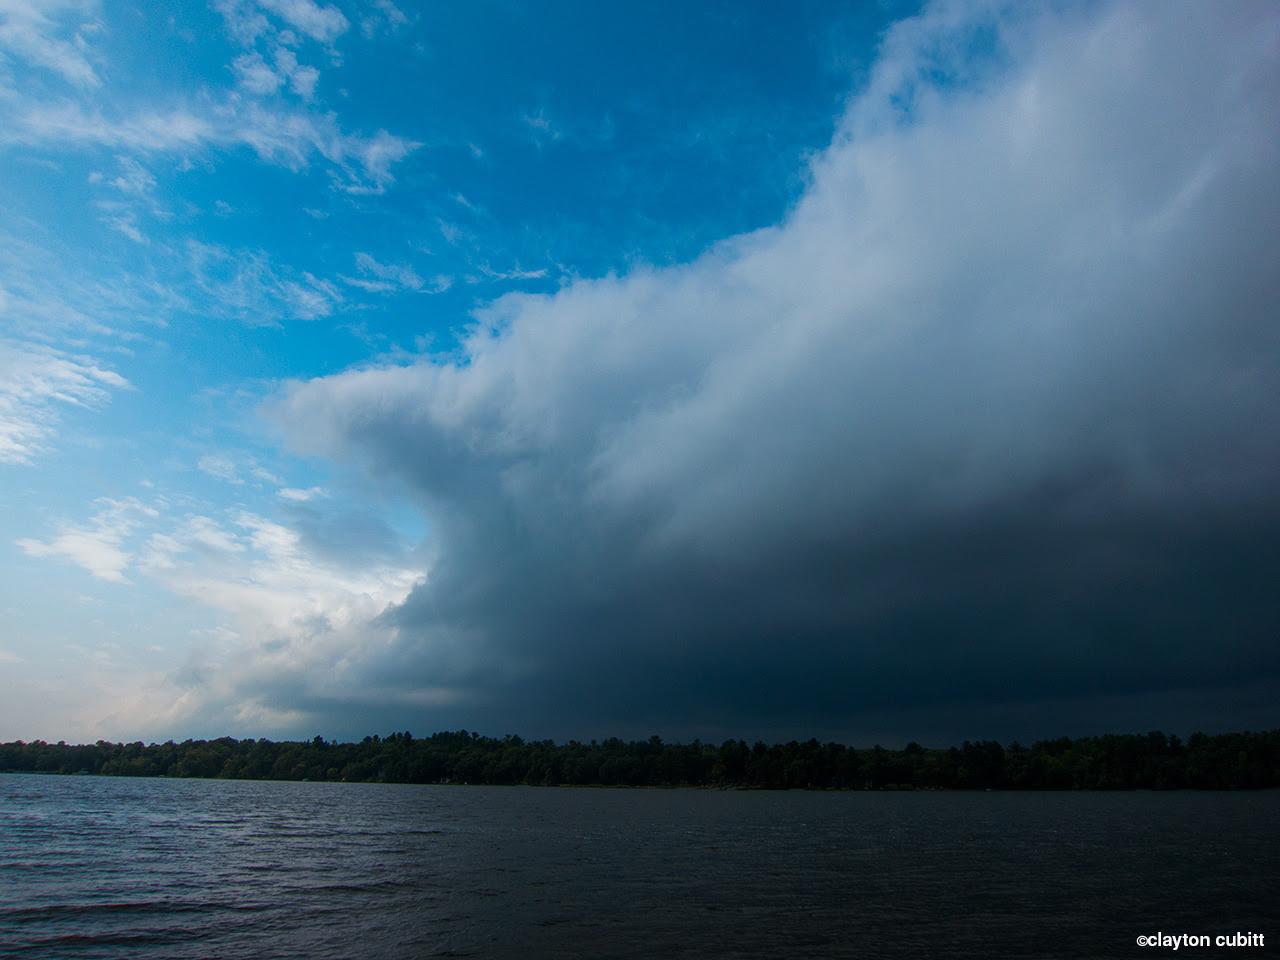 Rain clouds passing the lake, Minnesota  (2990)